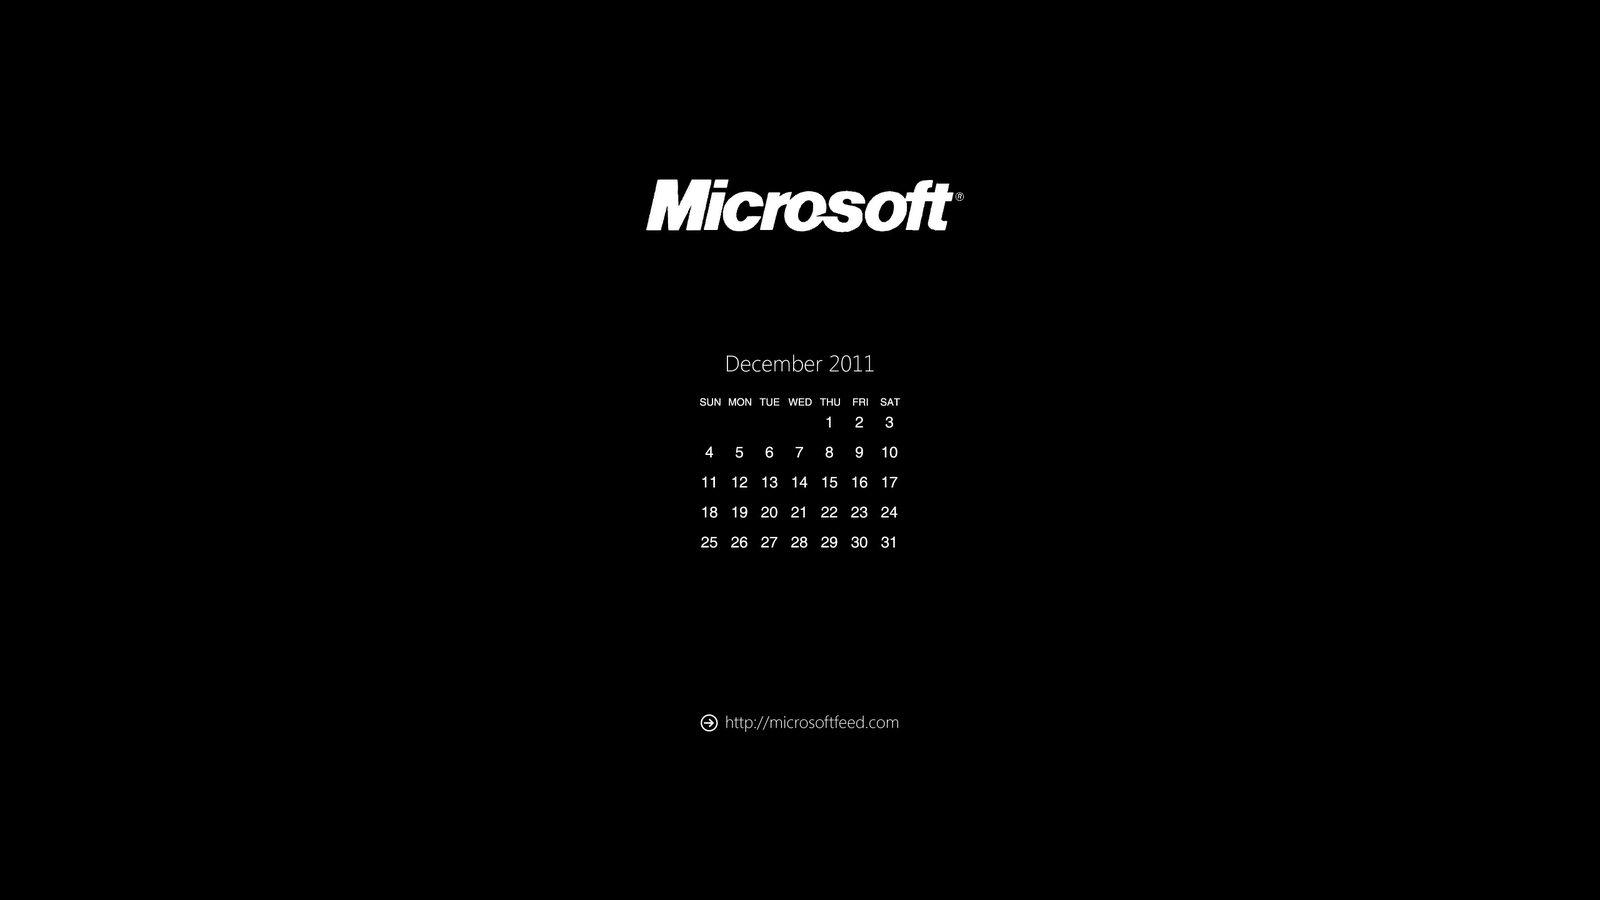 http://2.bp.blogspot.com/-yDqeXK7JqQA/TtvOcekLwcI/AAAAAAAAByo/Y5HB4v26xlk/s1600/Microsoft-Metro-Style-Desktop-Wallpaper-Calendar-December-2011.png